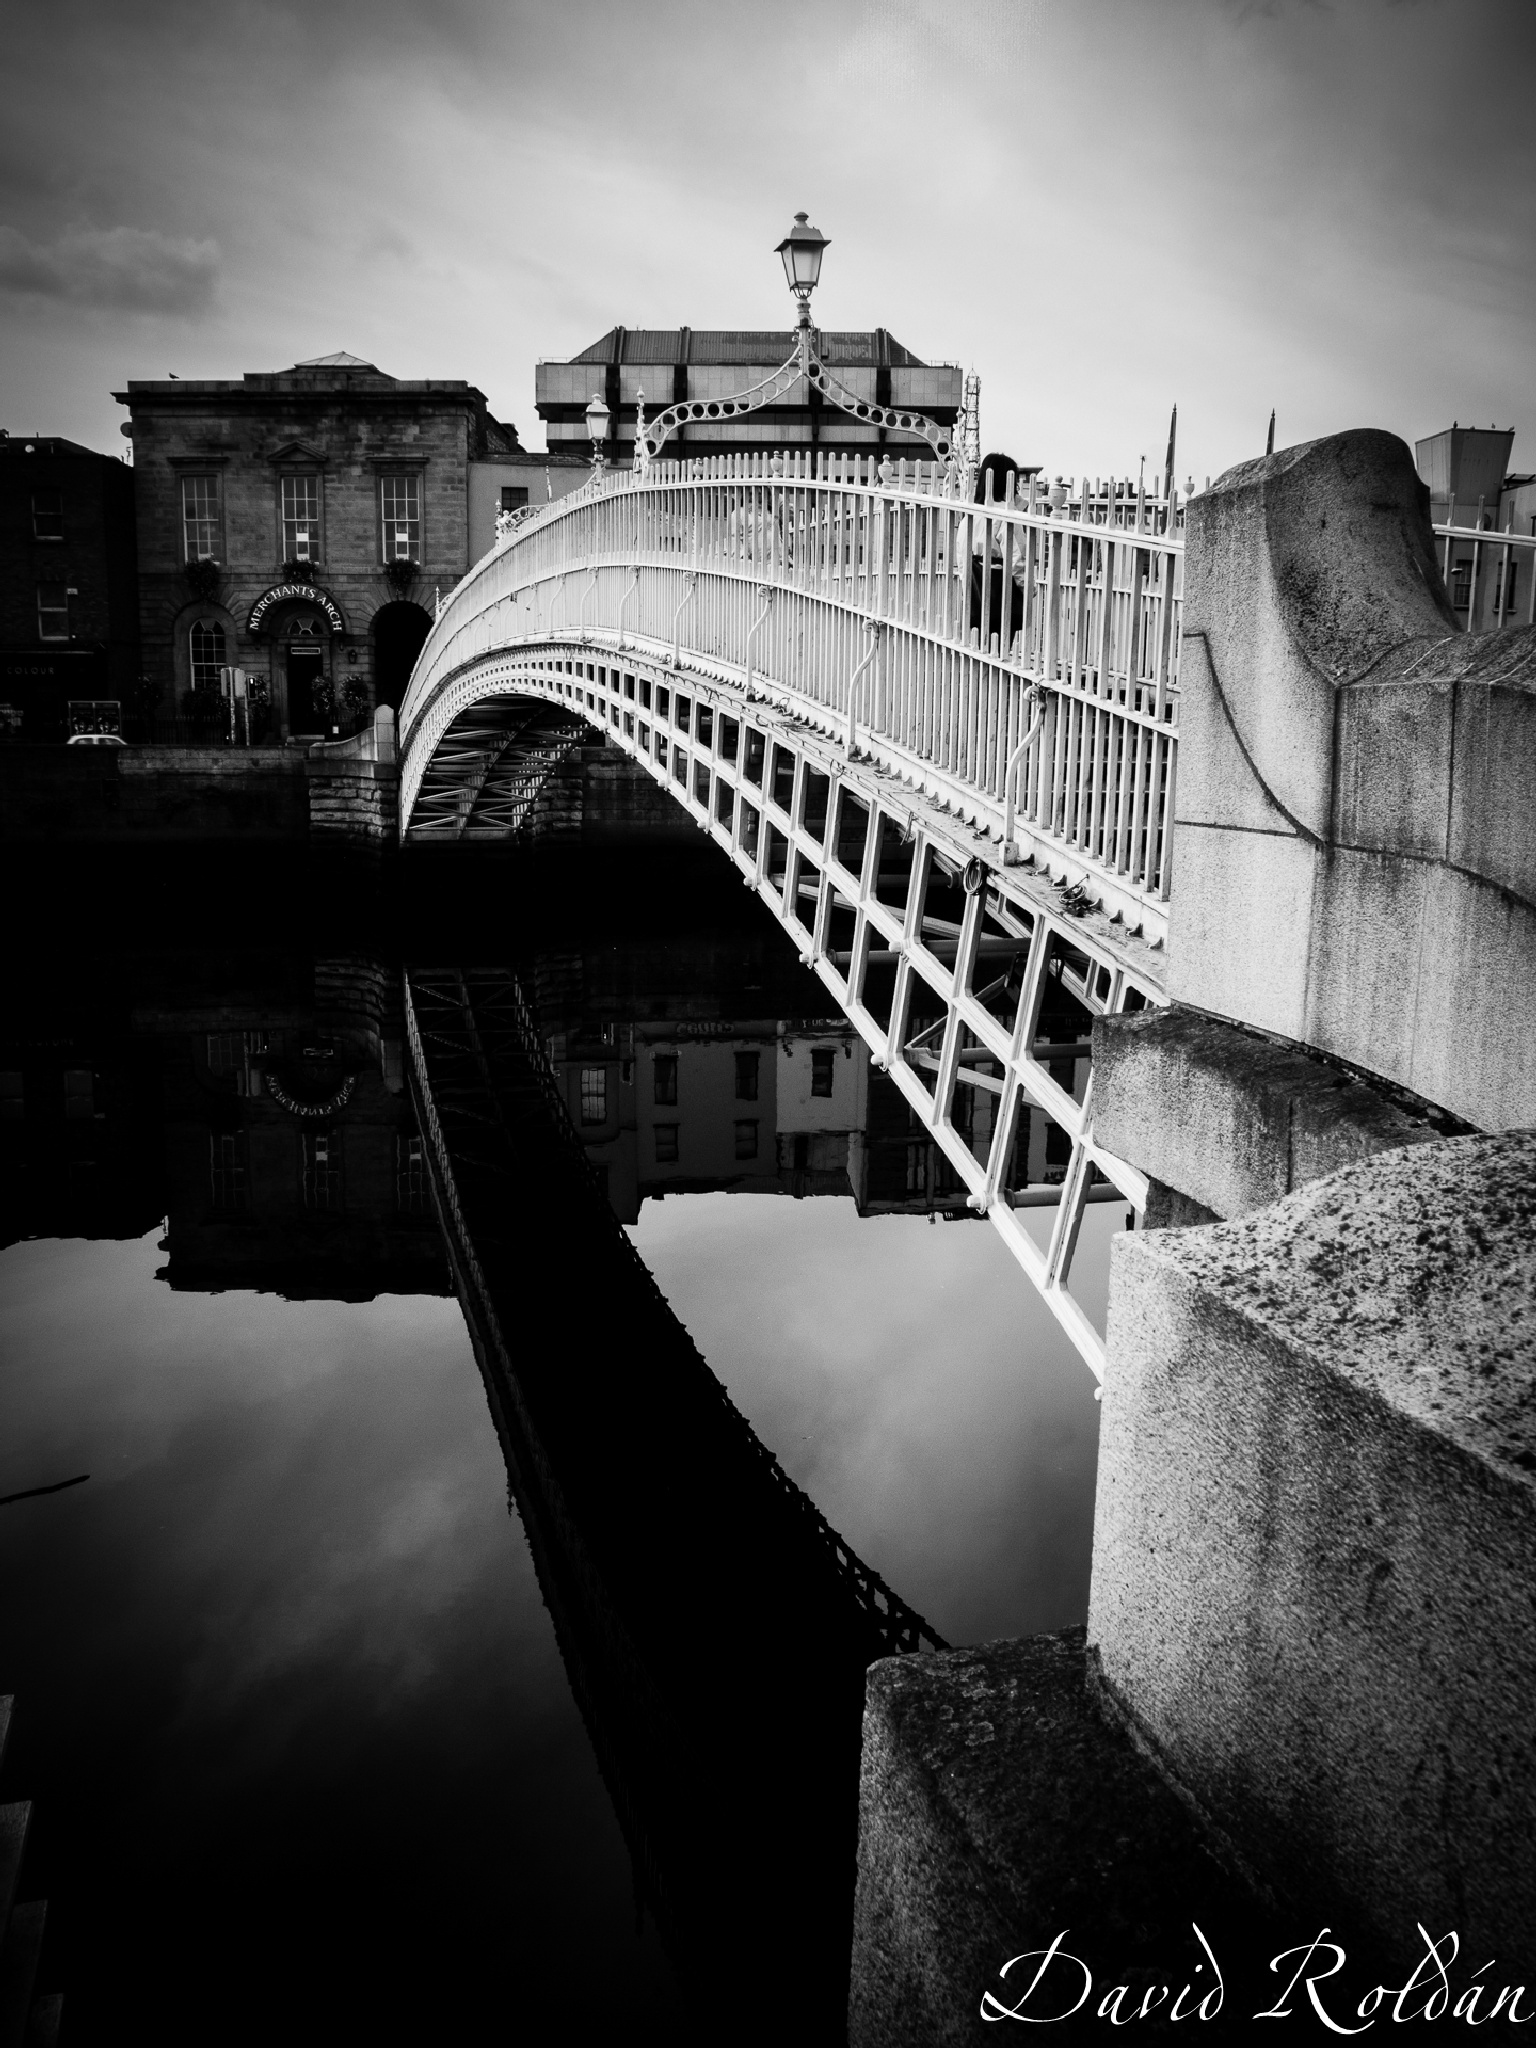 halfpenny bridge, Dublin by David Roldán